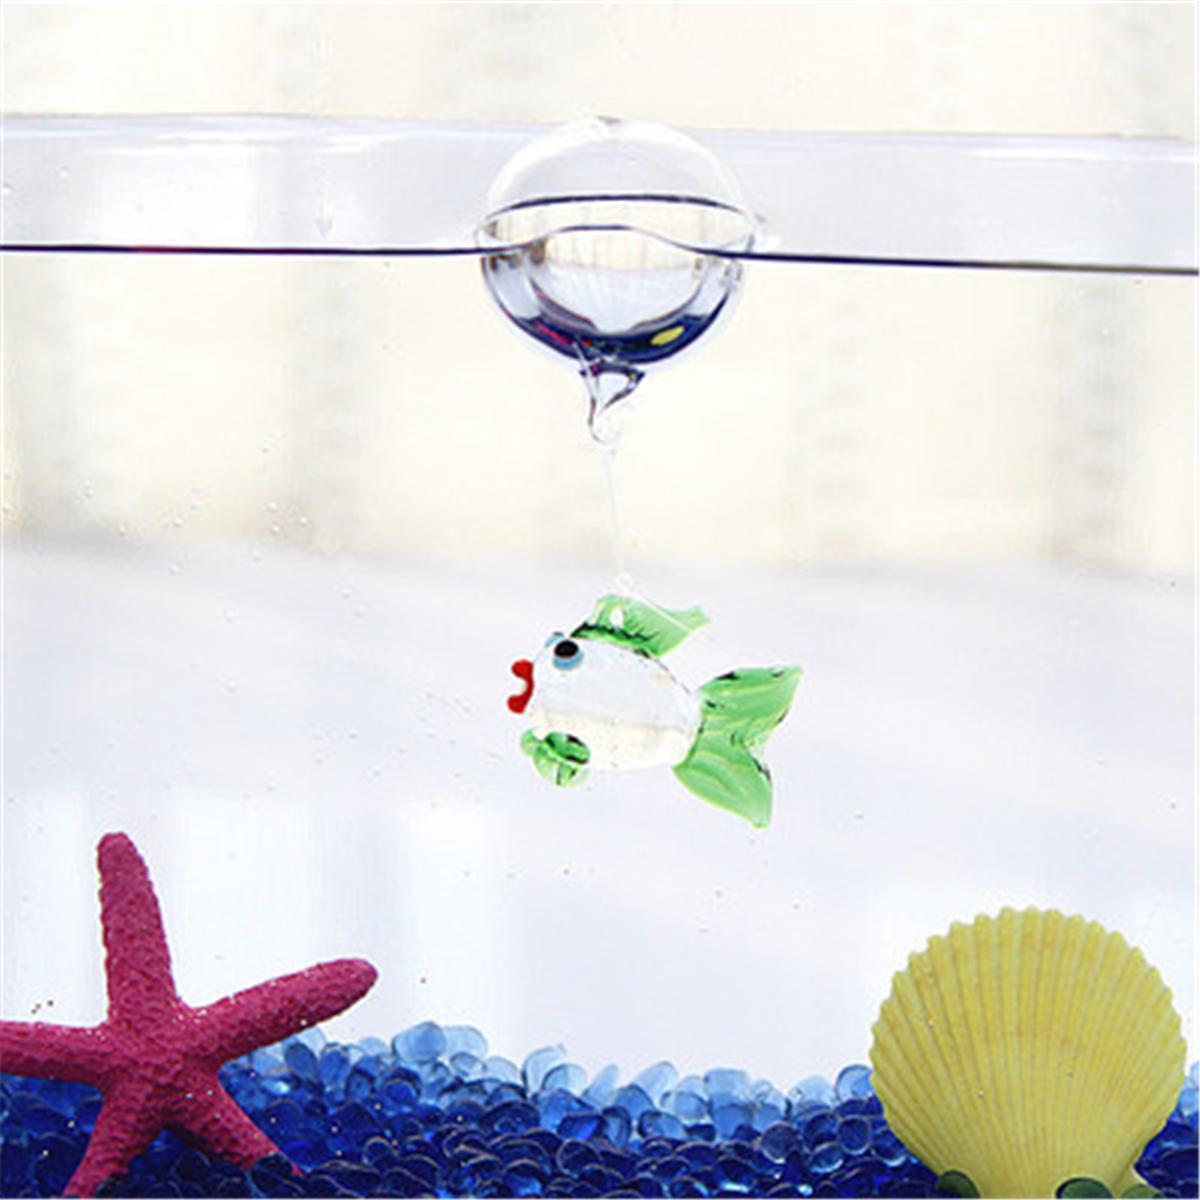 Aquarium Decorations,Colorful Floating Blown Glass Bubble Micro Fish Tank Landscape Ornament Deco Aquarium Fish Charms